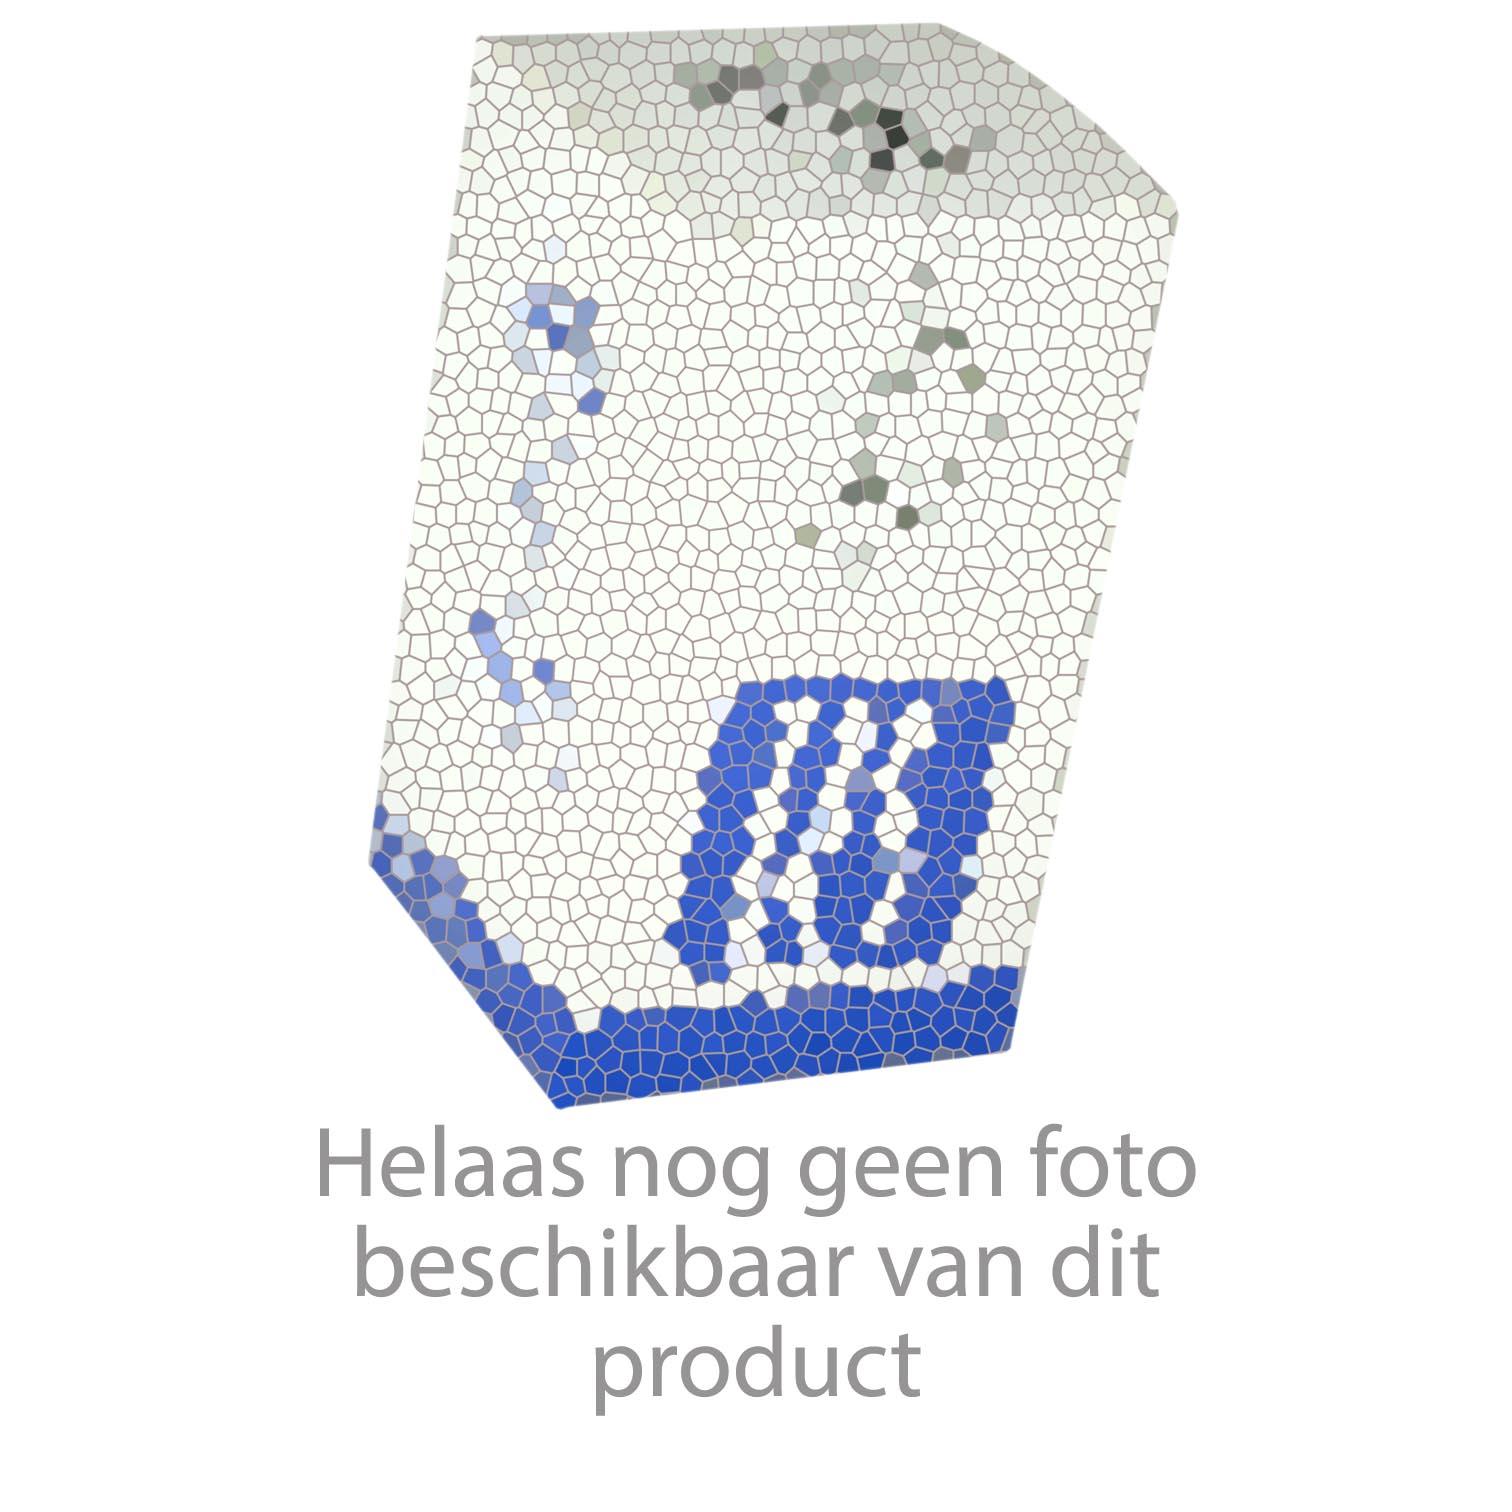 Gessi Onderdelen OXYGENE  HI TECH 2-gats Keukenkraan Artikelnummer 17435.031 / 17435.149